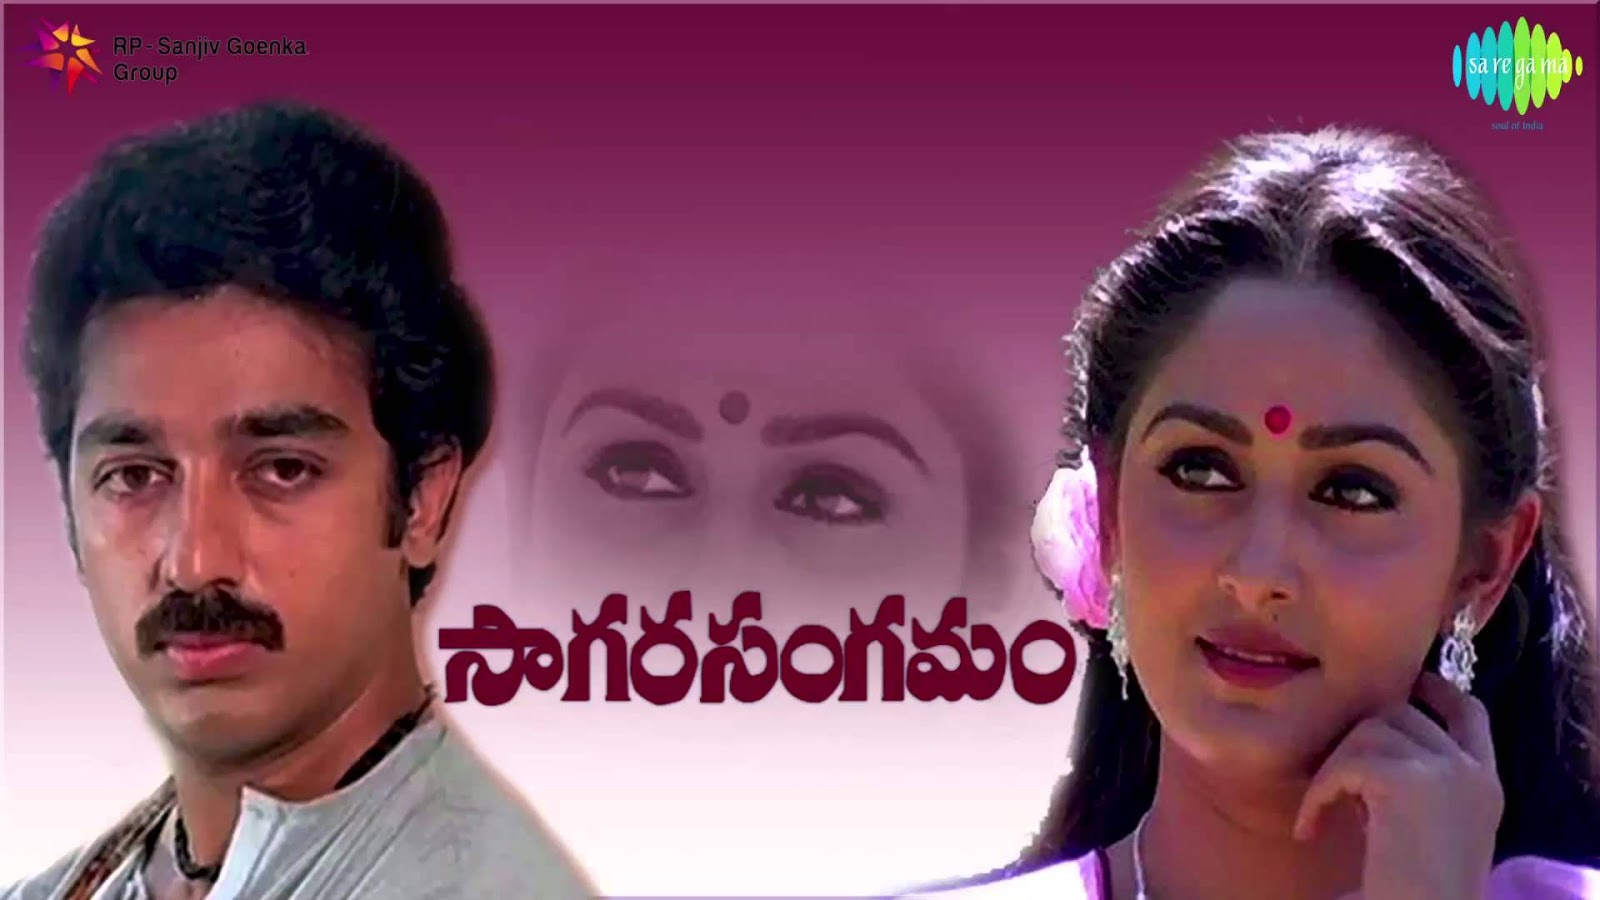 Download Tamil Mp3 Songs Salangai OLi